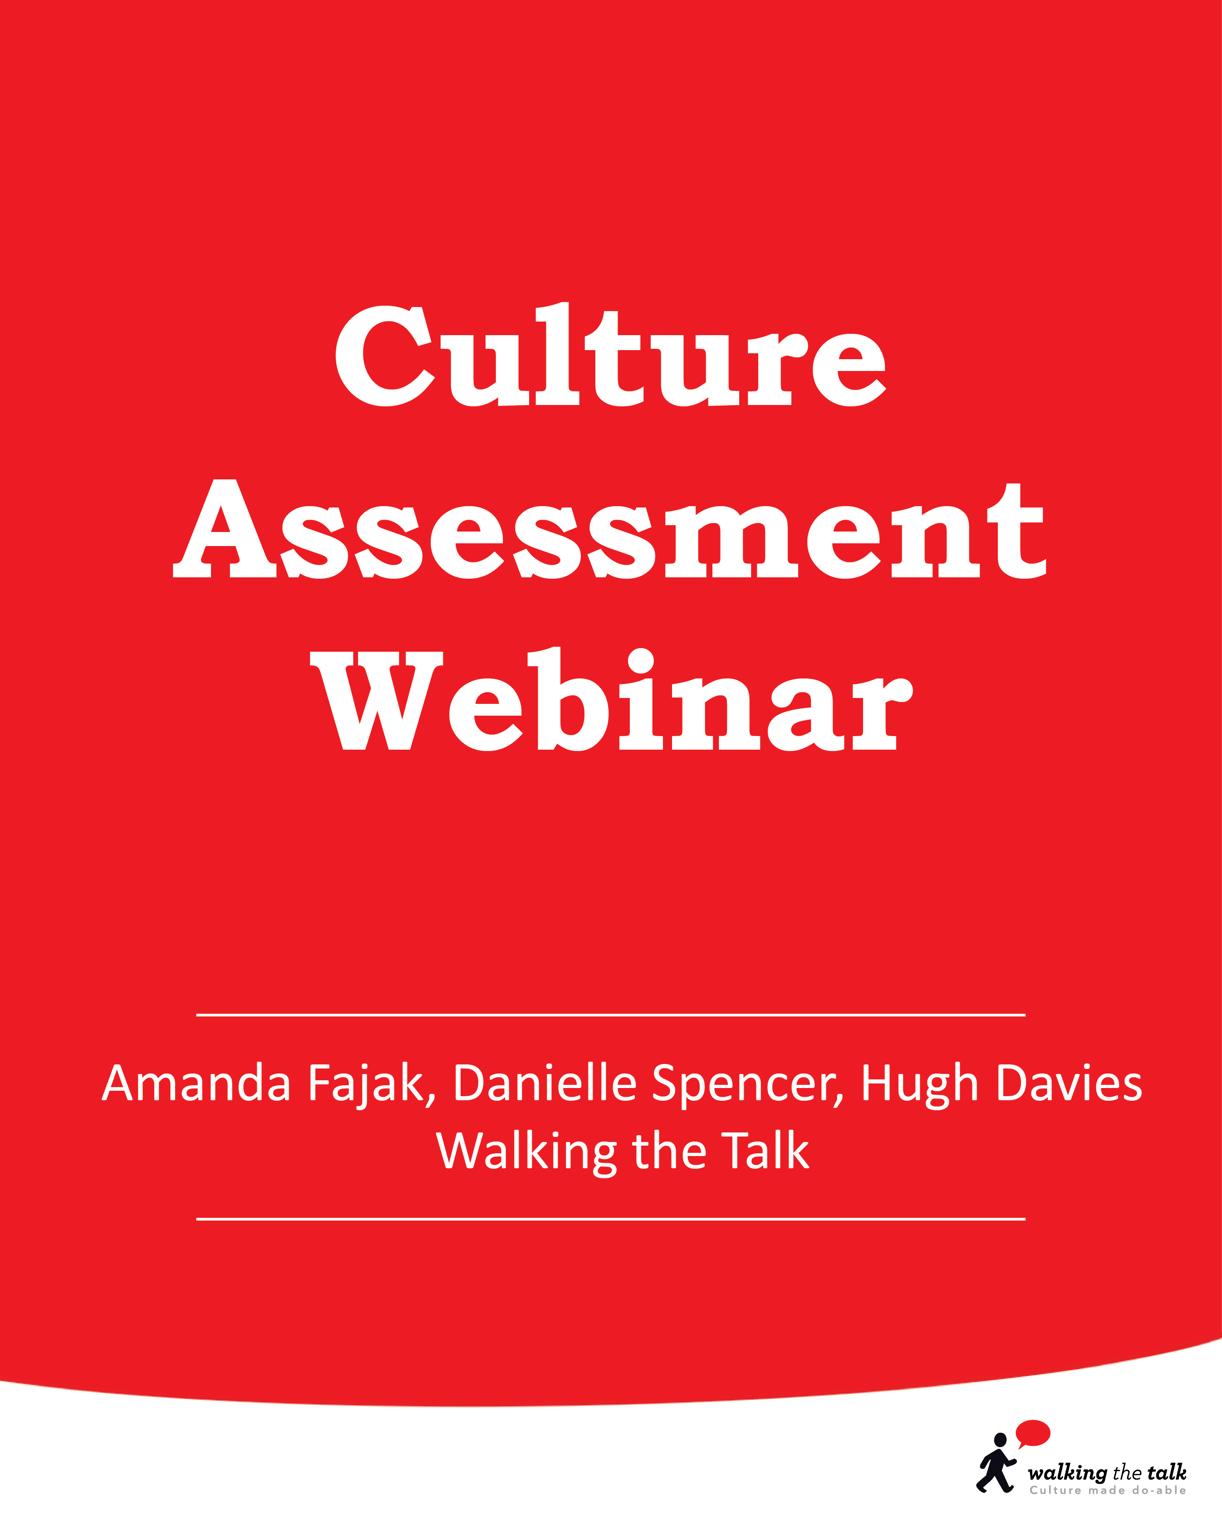 Culture Assessment Webinar